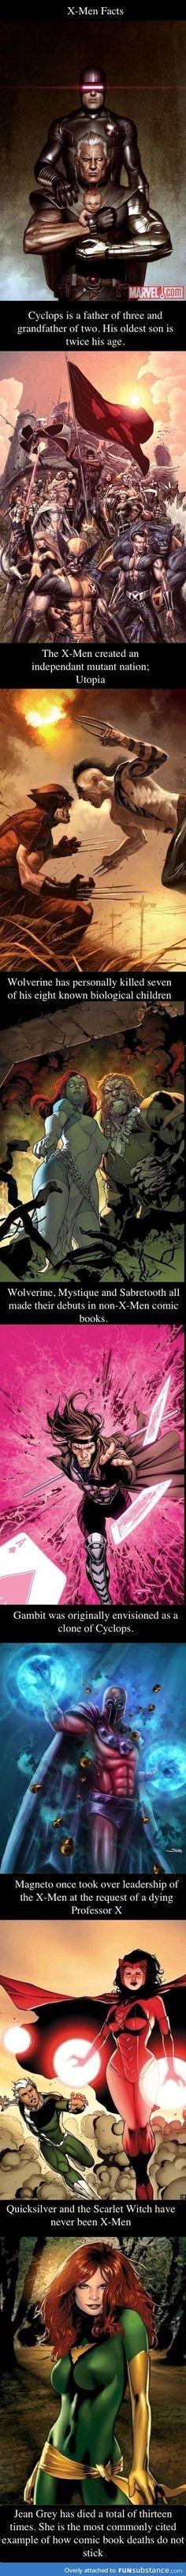 X-Men Facts !